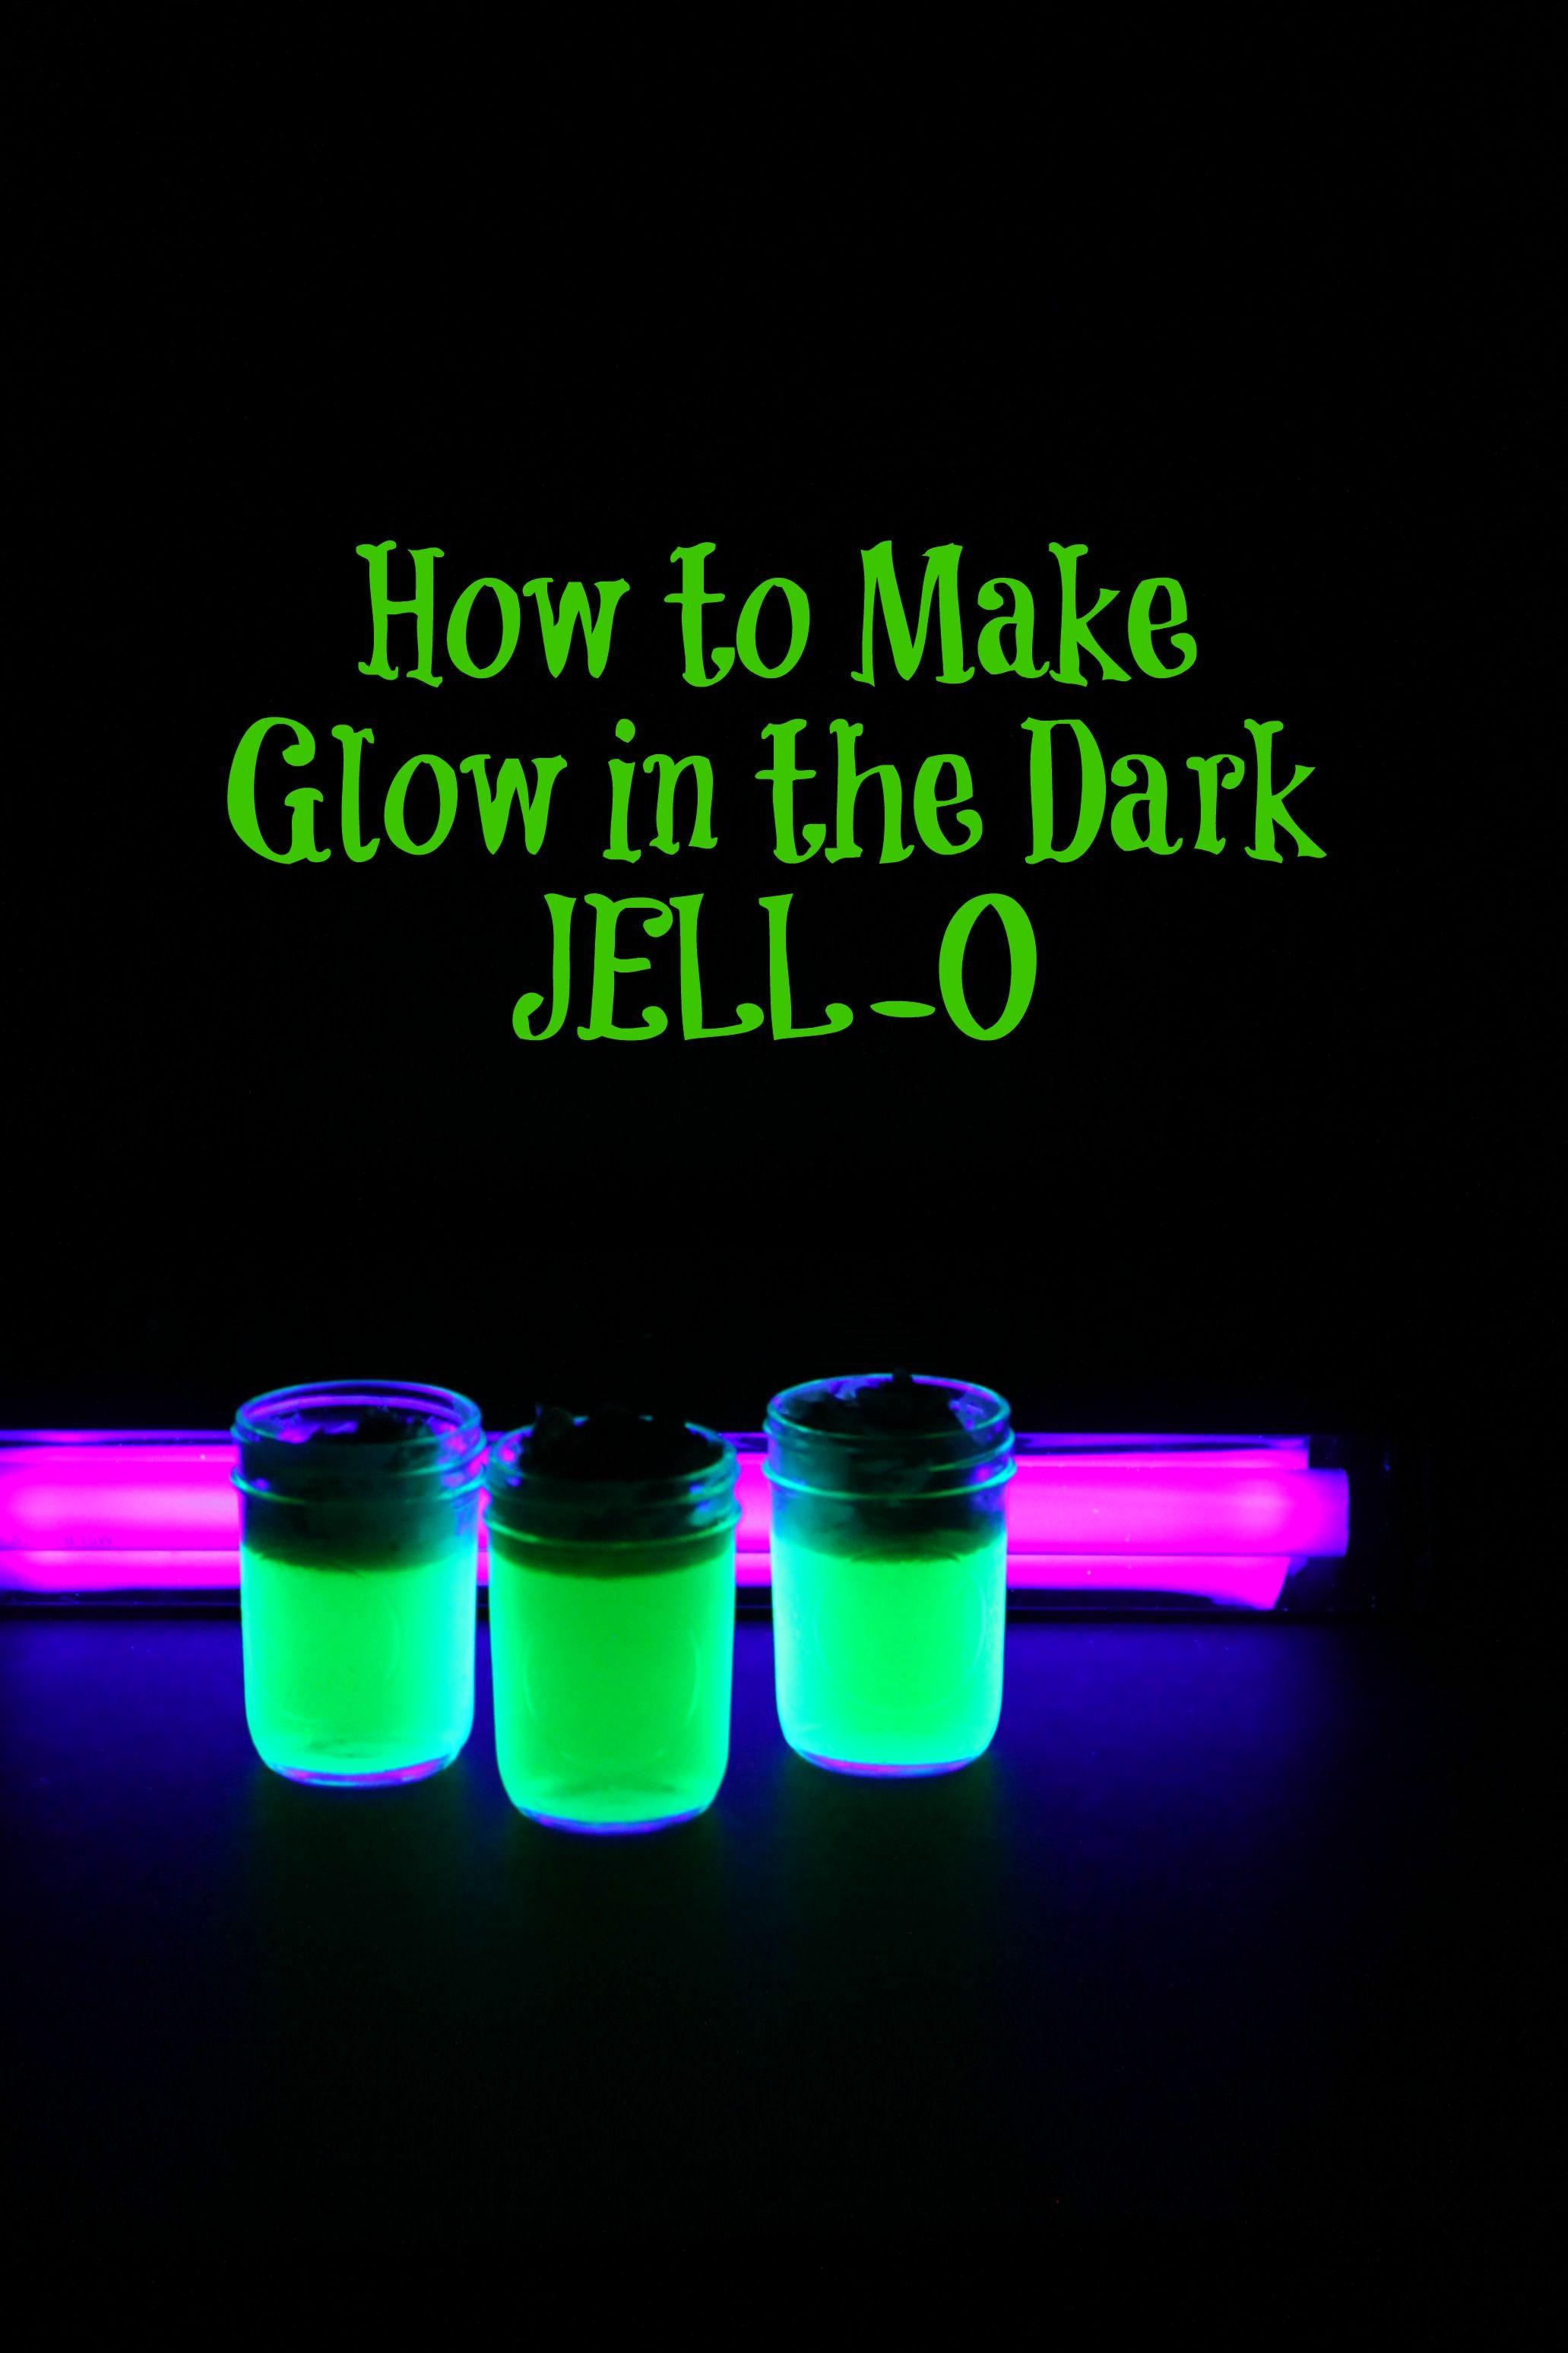 Glow in the Dark JELLO Recipe Girls magazine and Jello